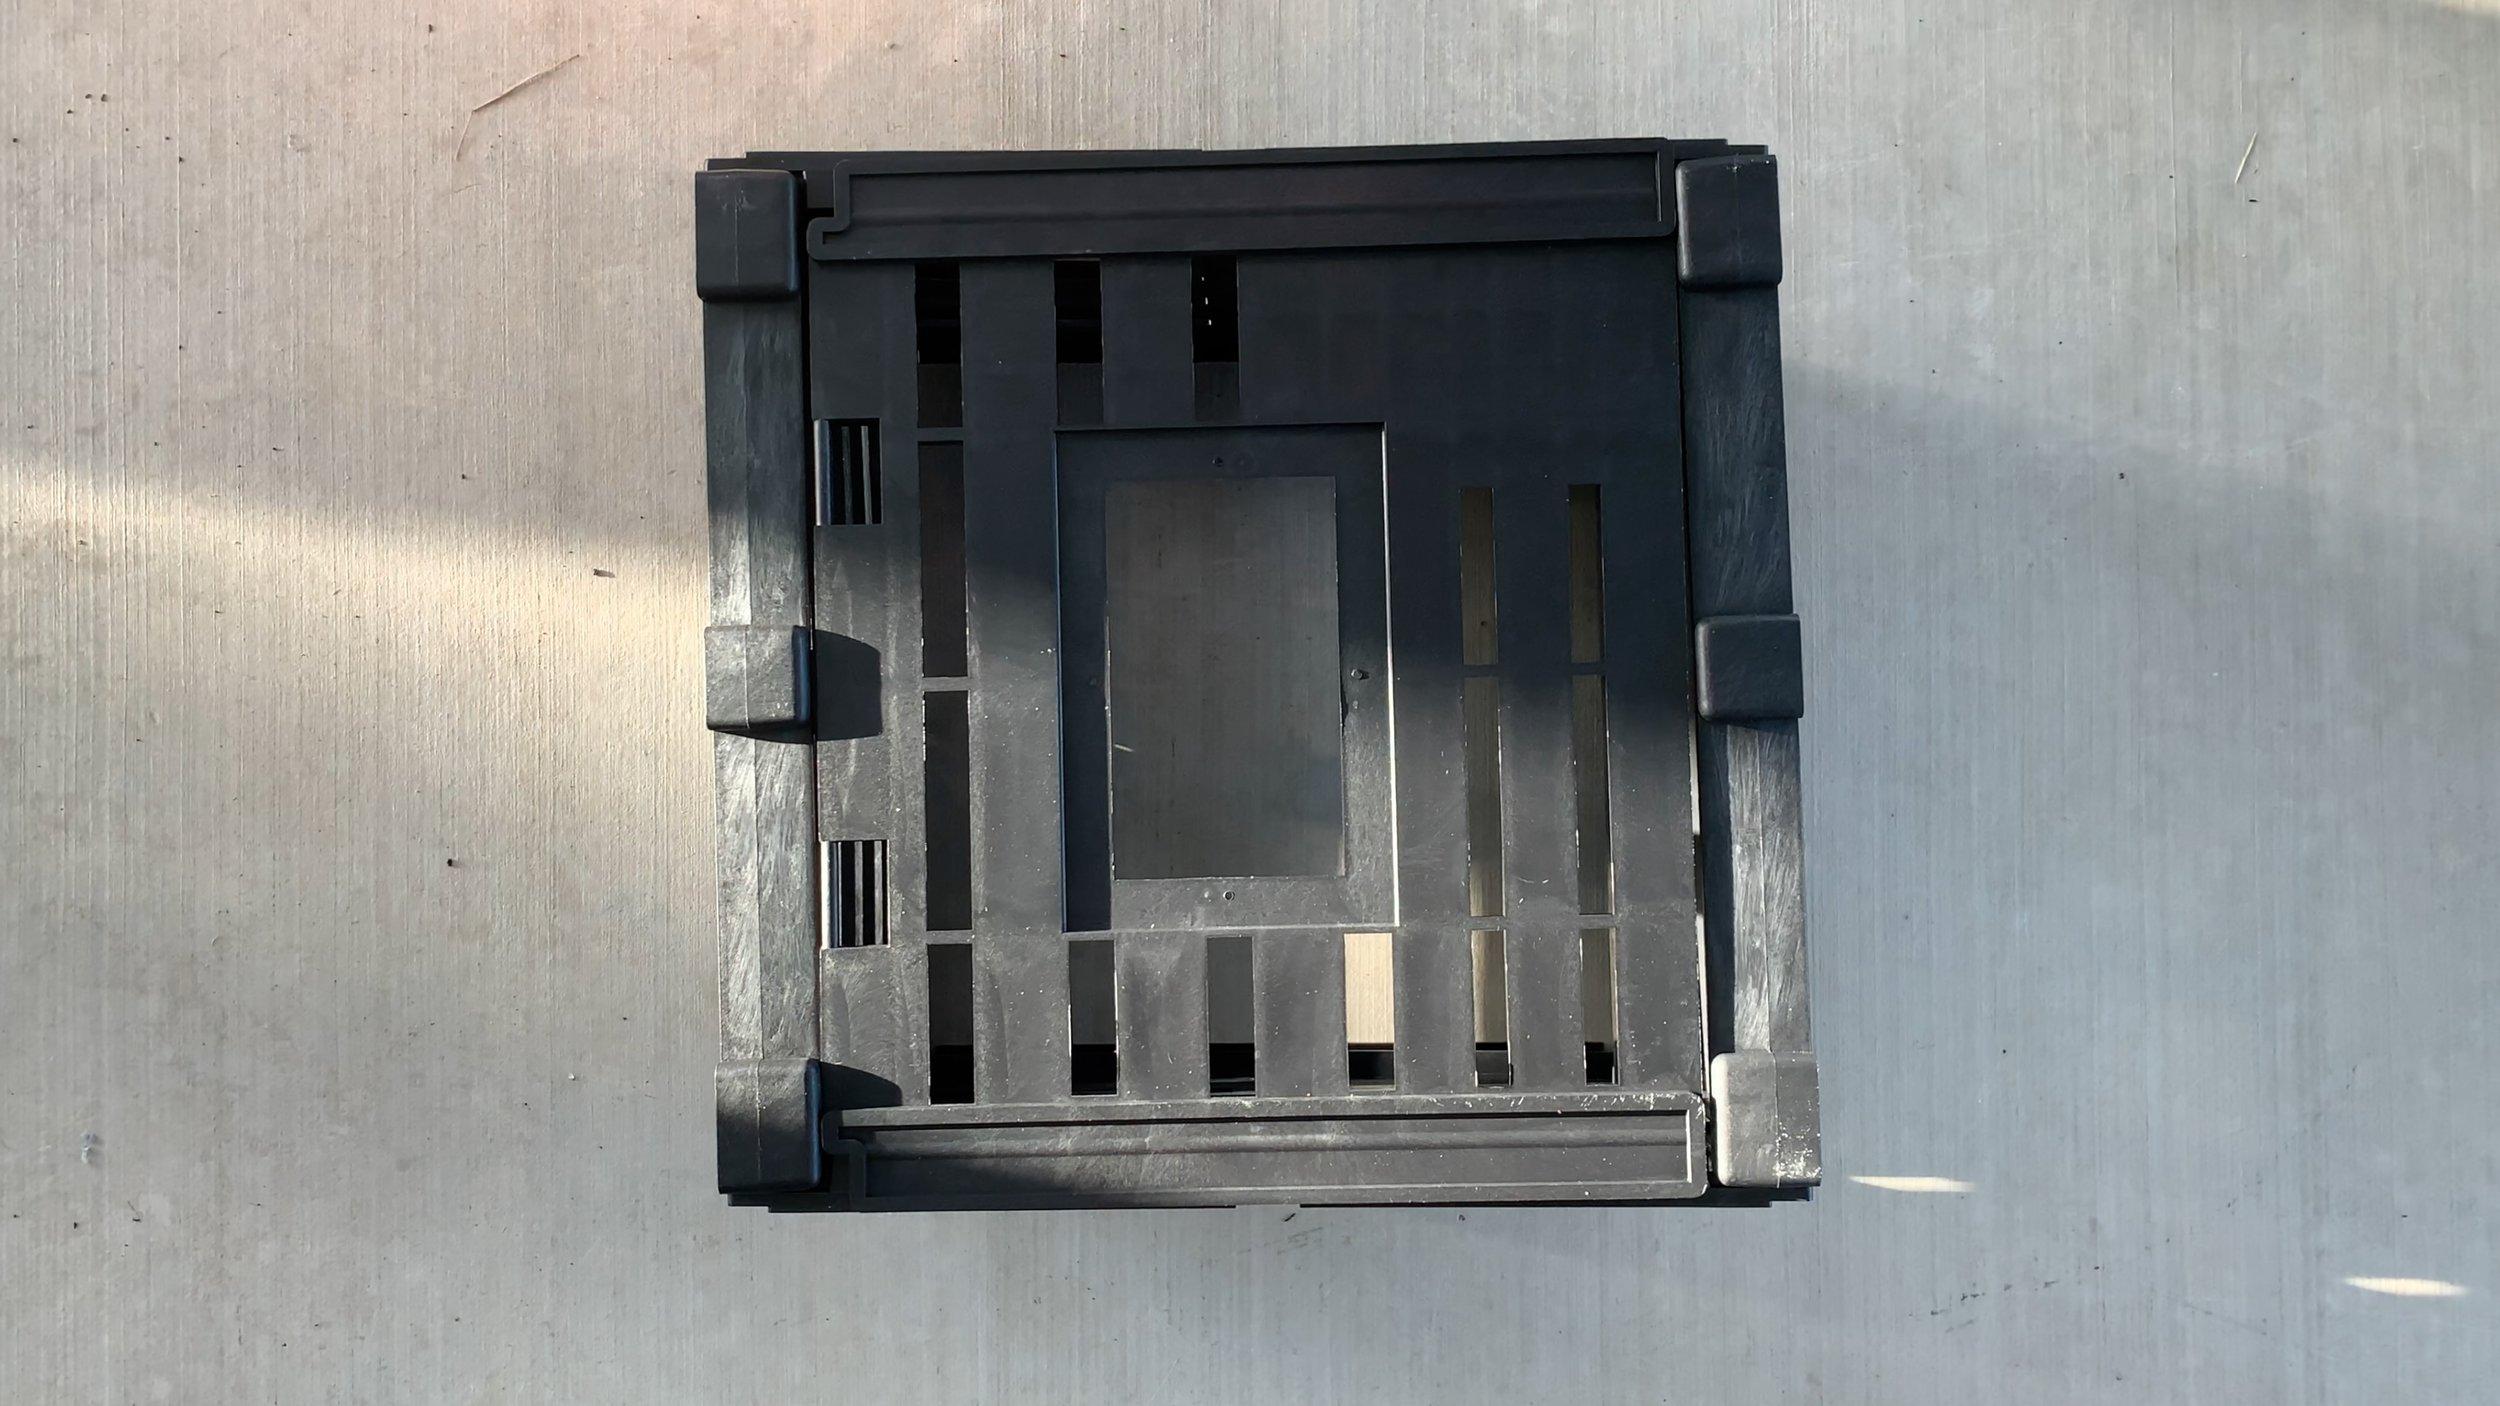 Building traps images 4.jpg